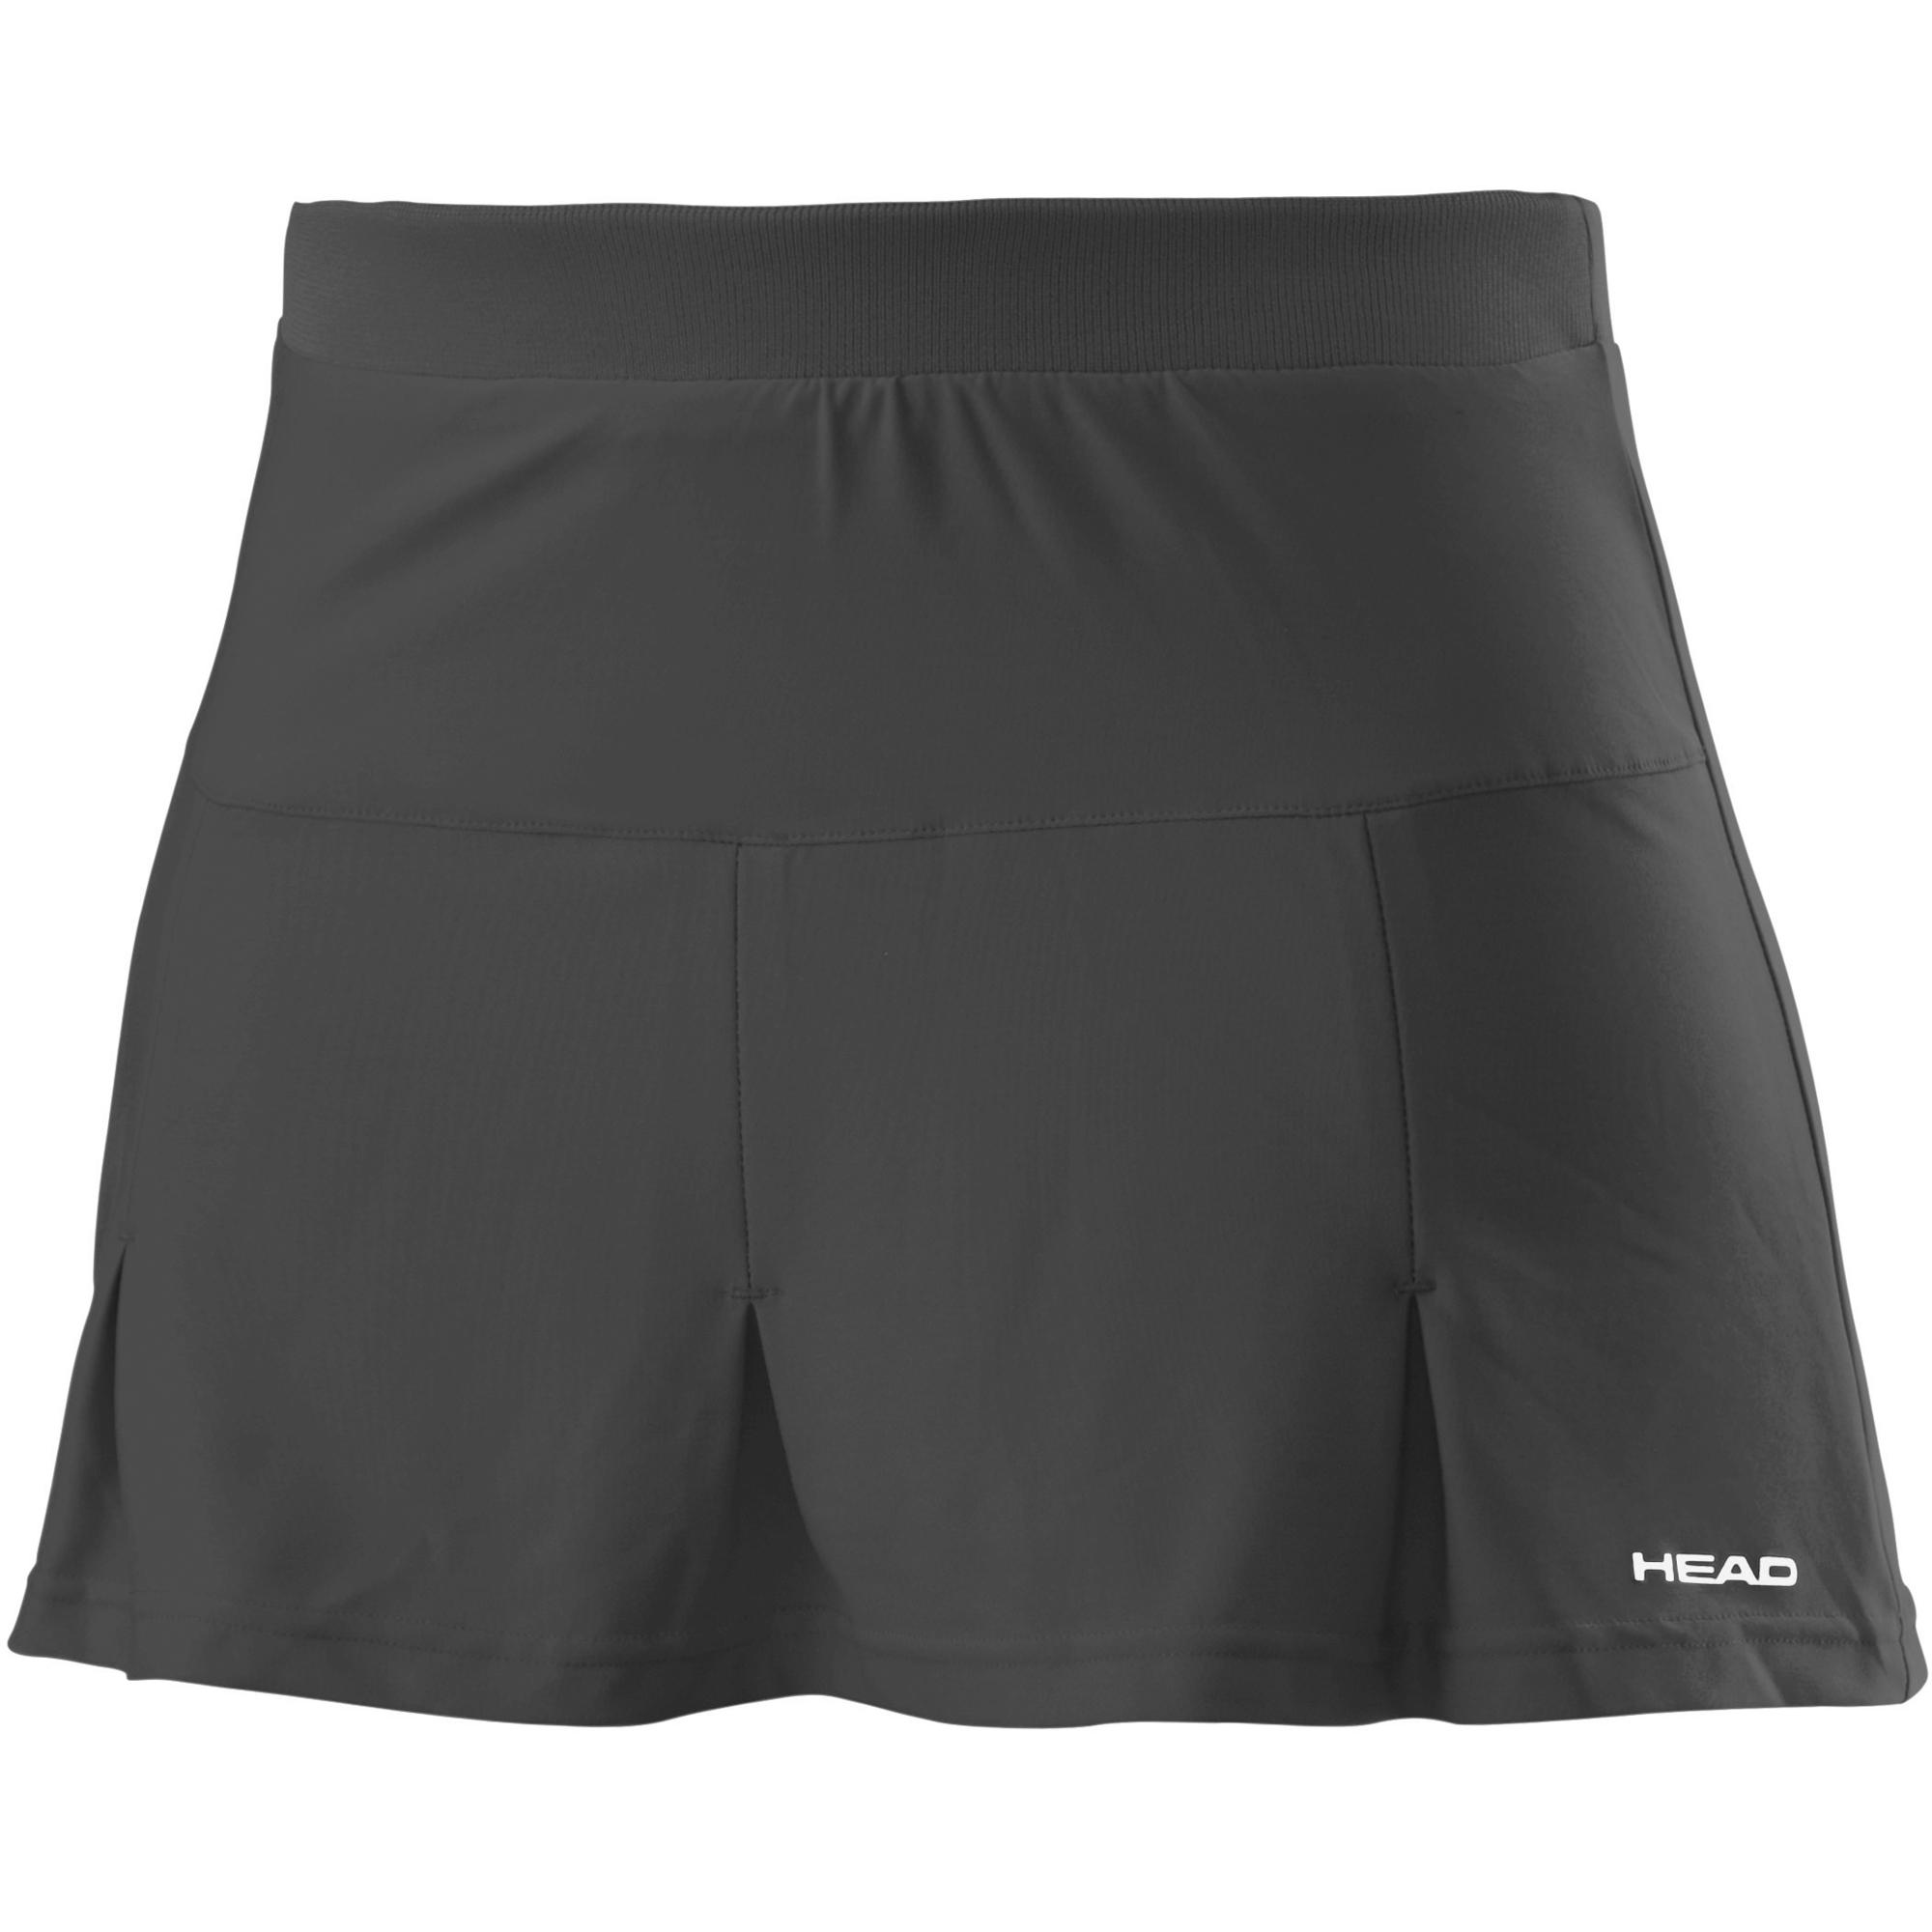 Head Club Basic Ladies Skort - Black, XL